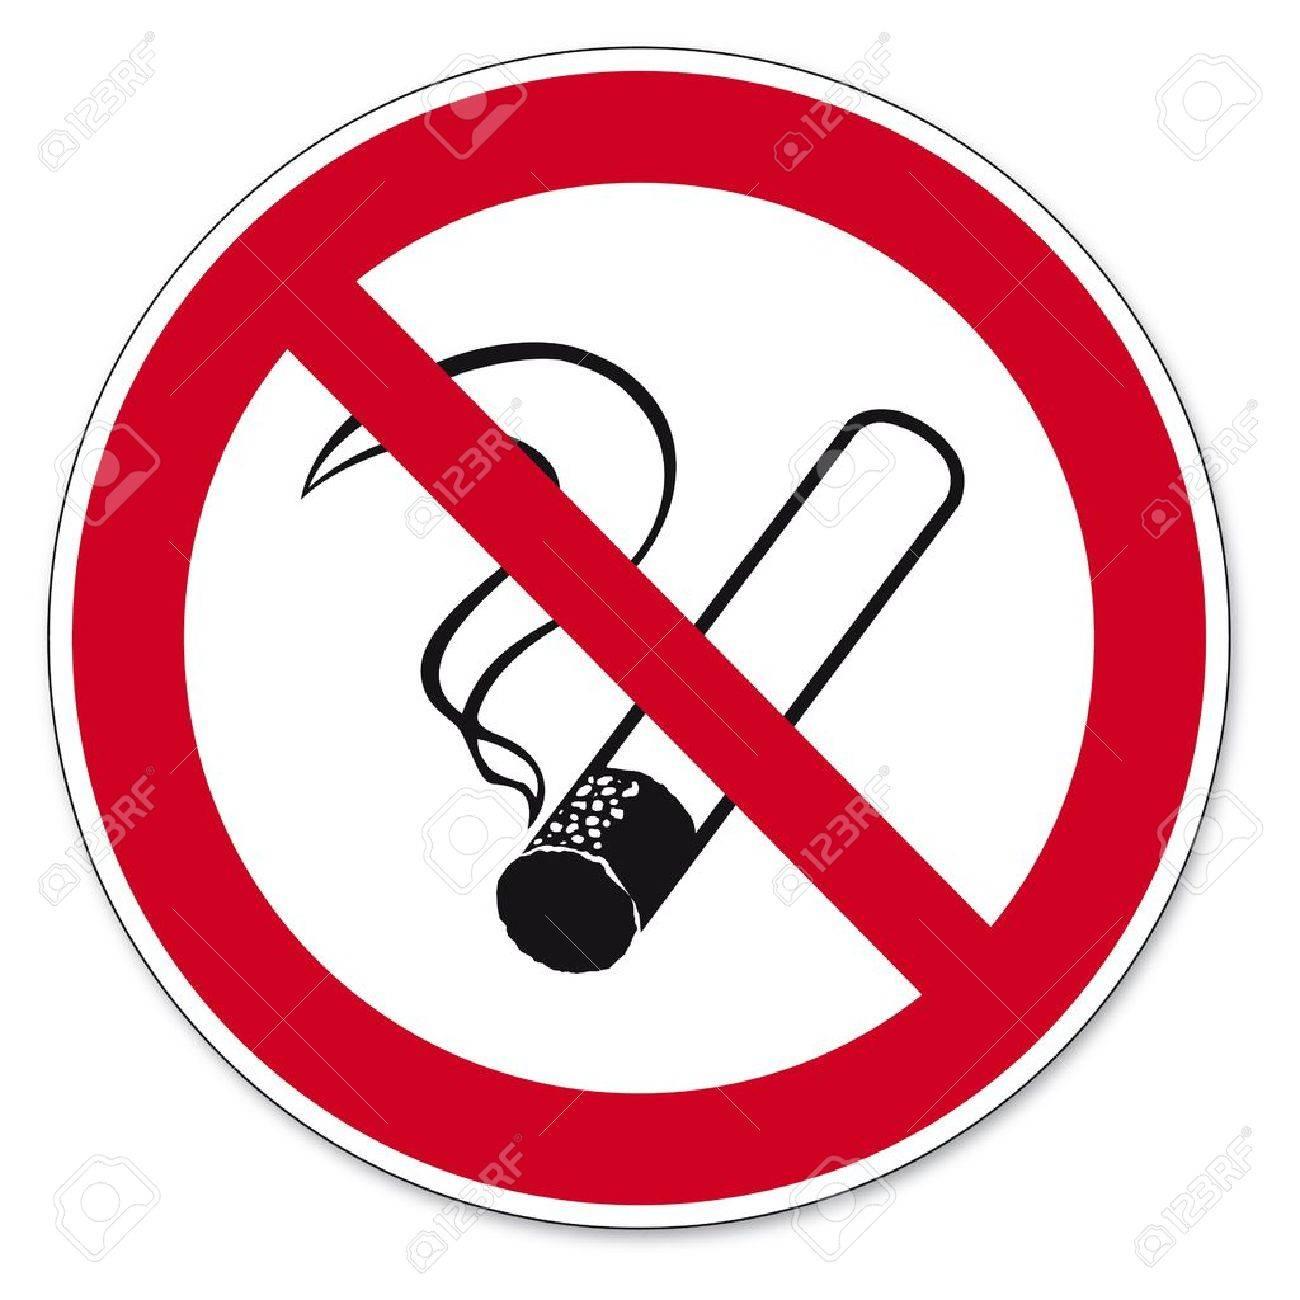 Prohibition signs BGV icon pictogram No smoking cigarette Stock Vector - 14511791